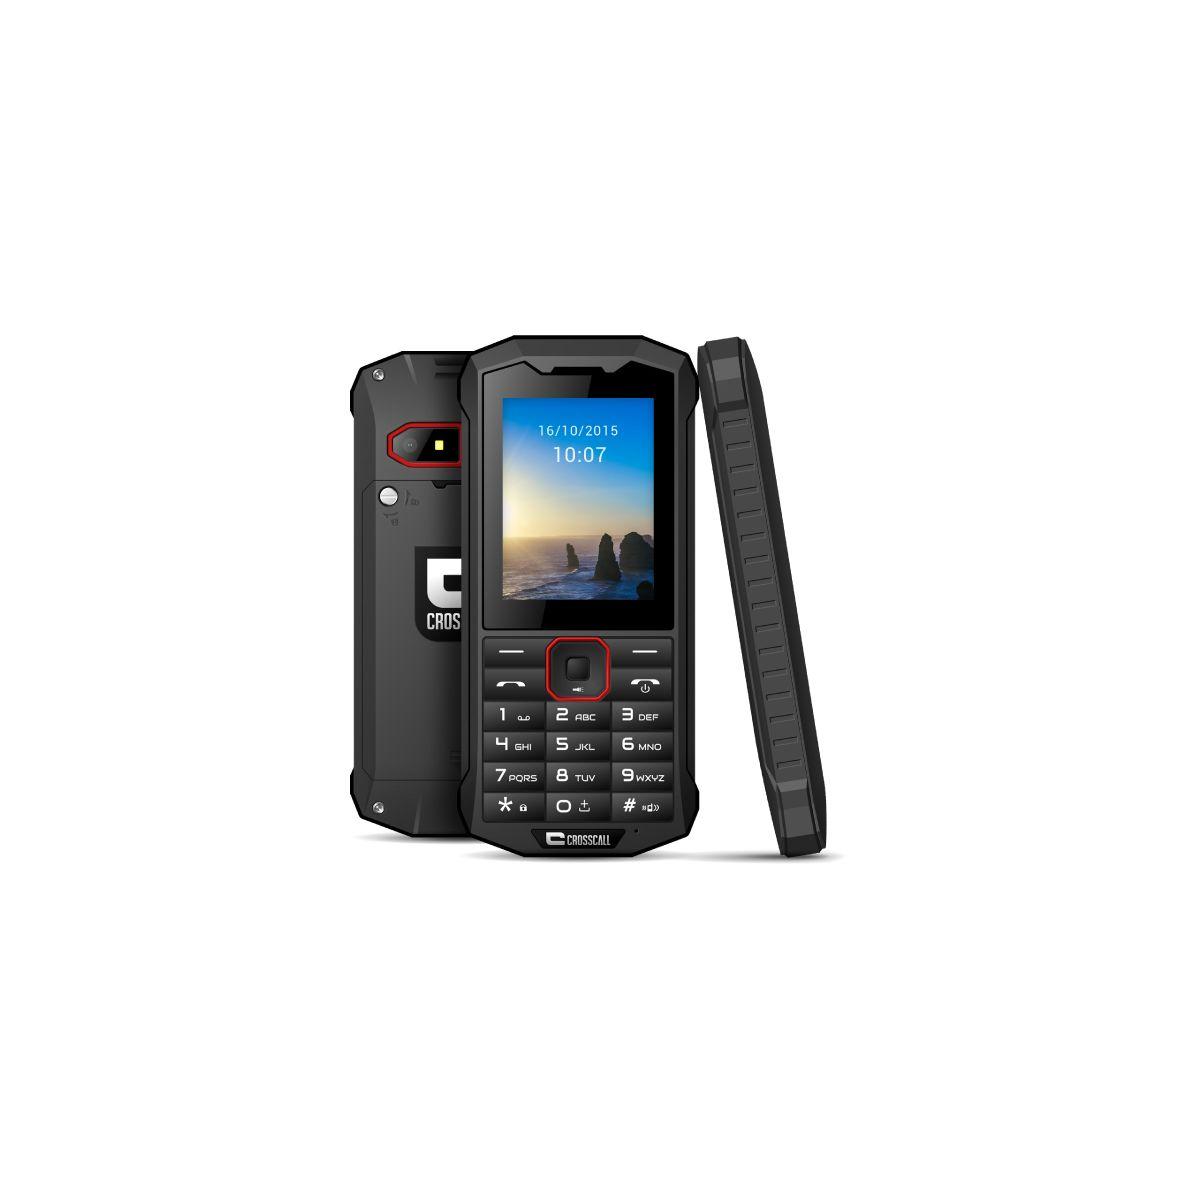 Téléphone mobile tout-terrain CROSSCALL Spider X4 Noir